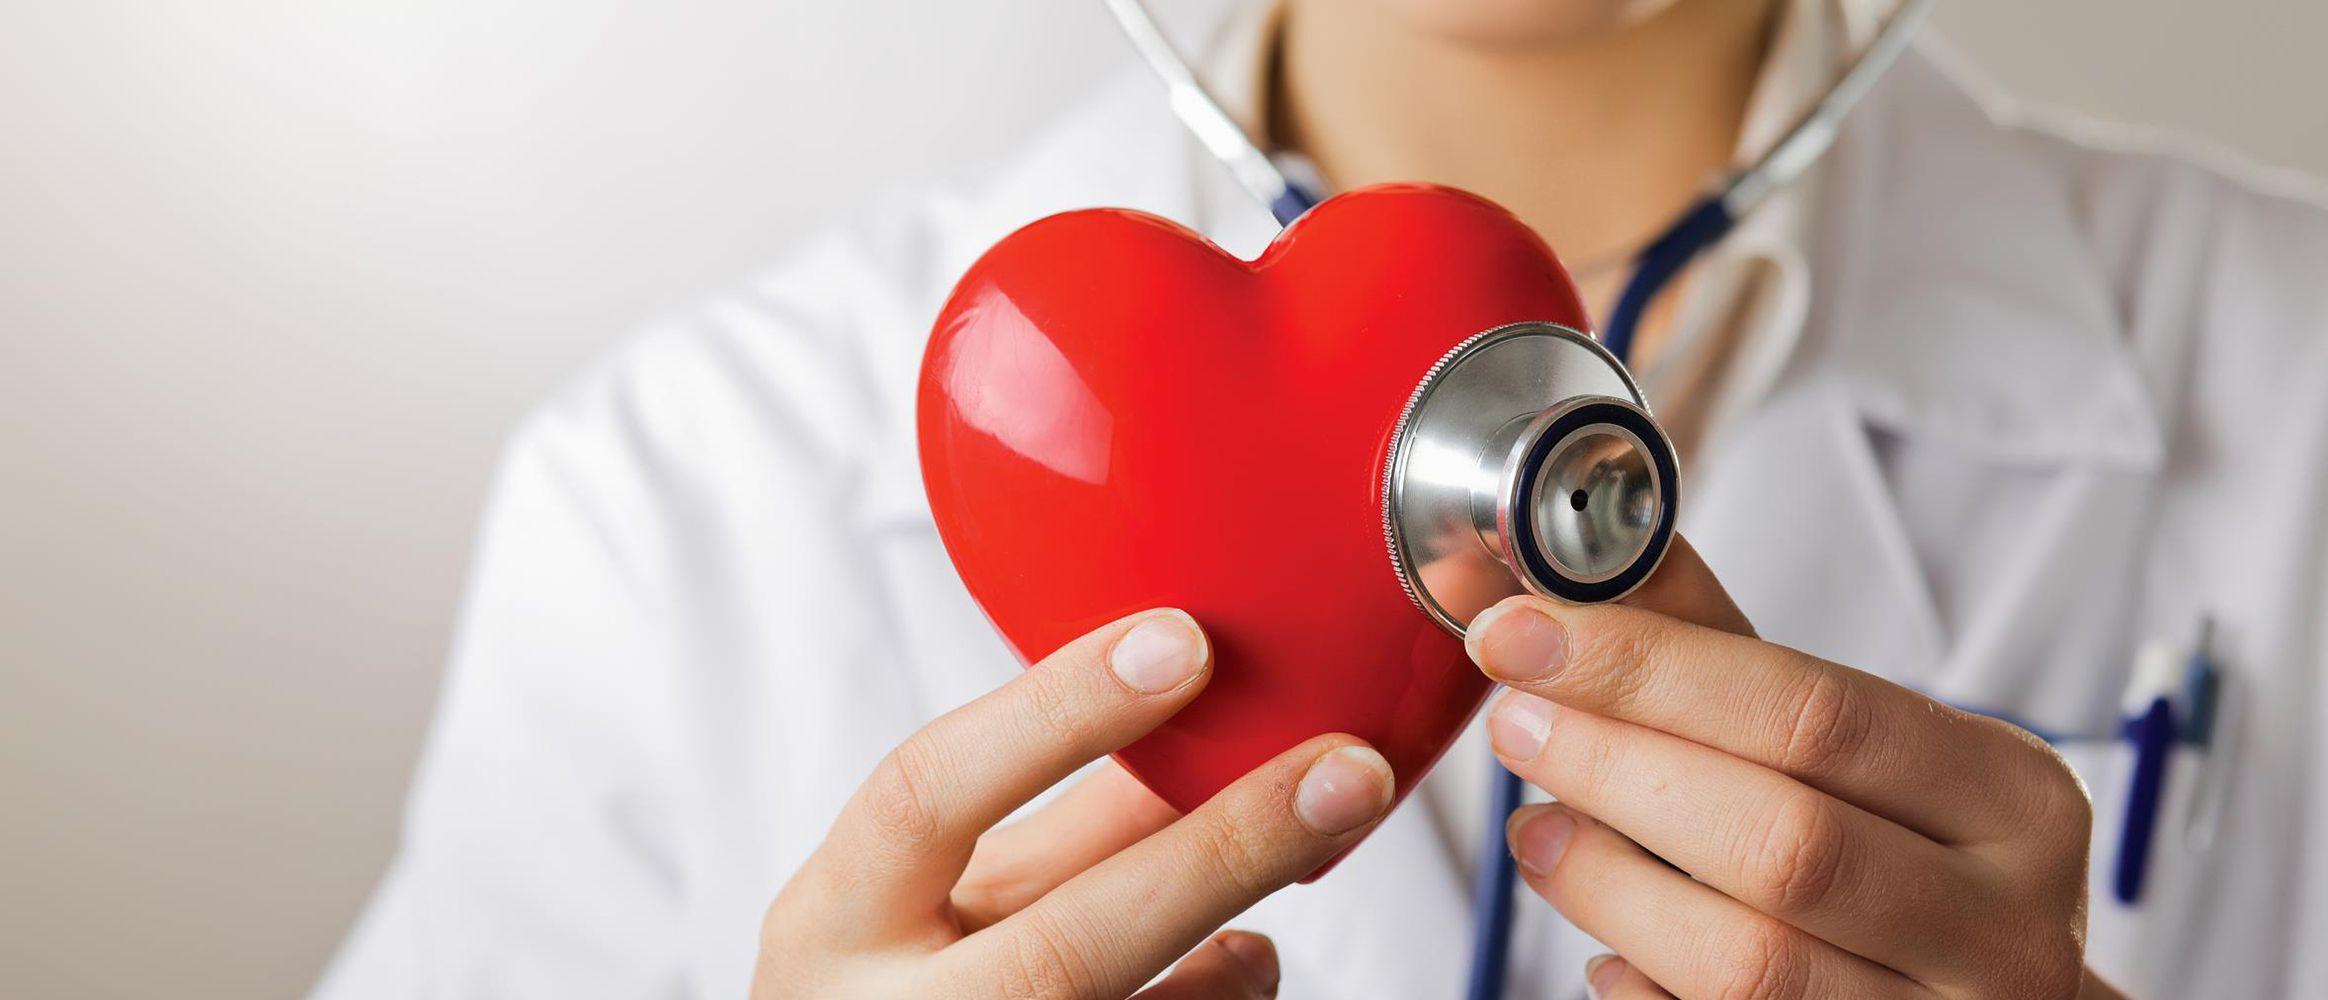 doctor with heart stethoscope - Кардиология. Здоровое сердце